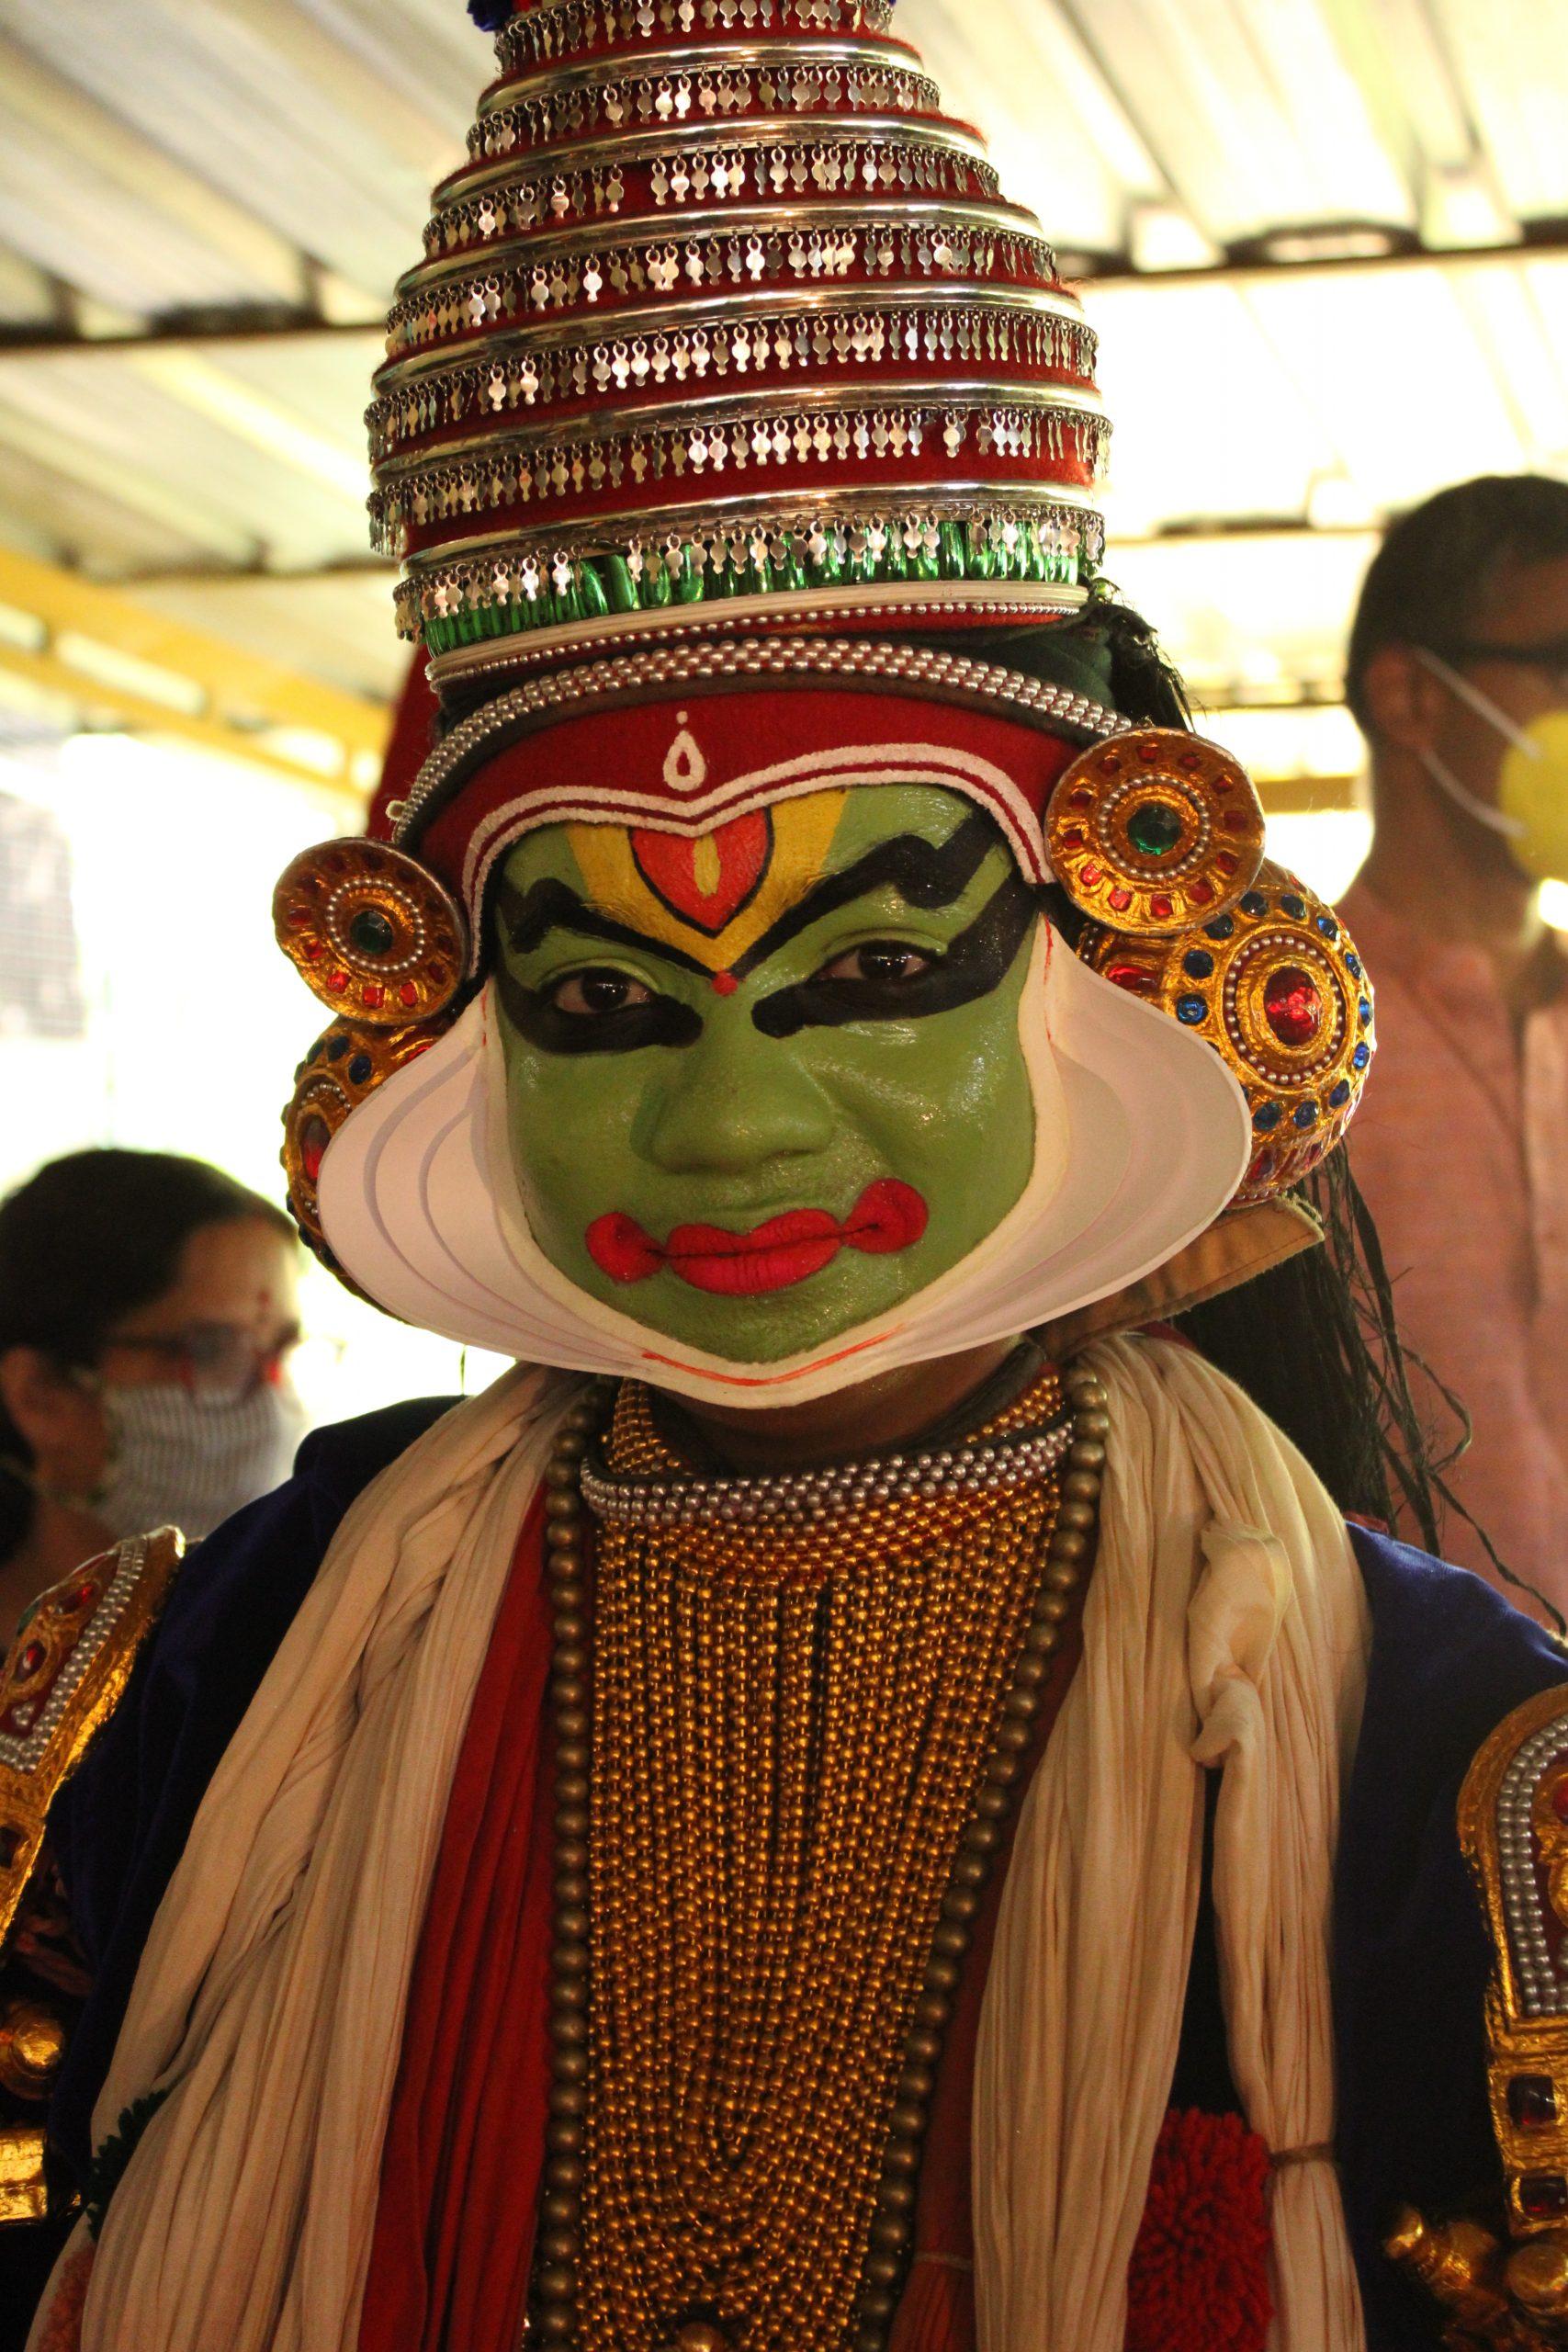 A portrait of a kathakali dance artist